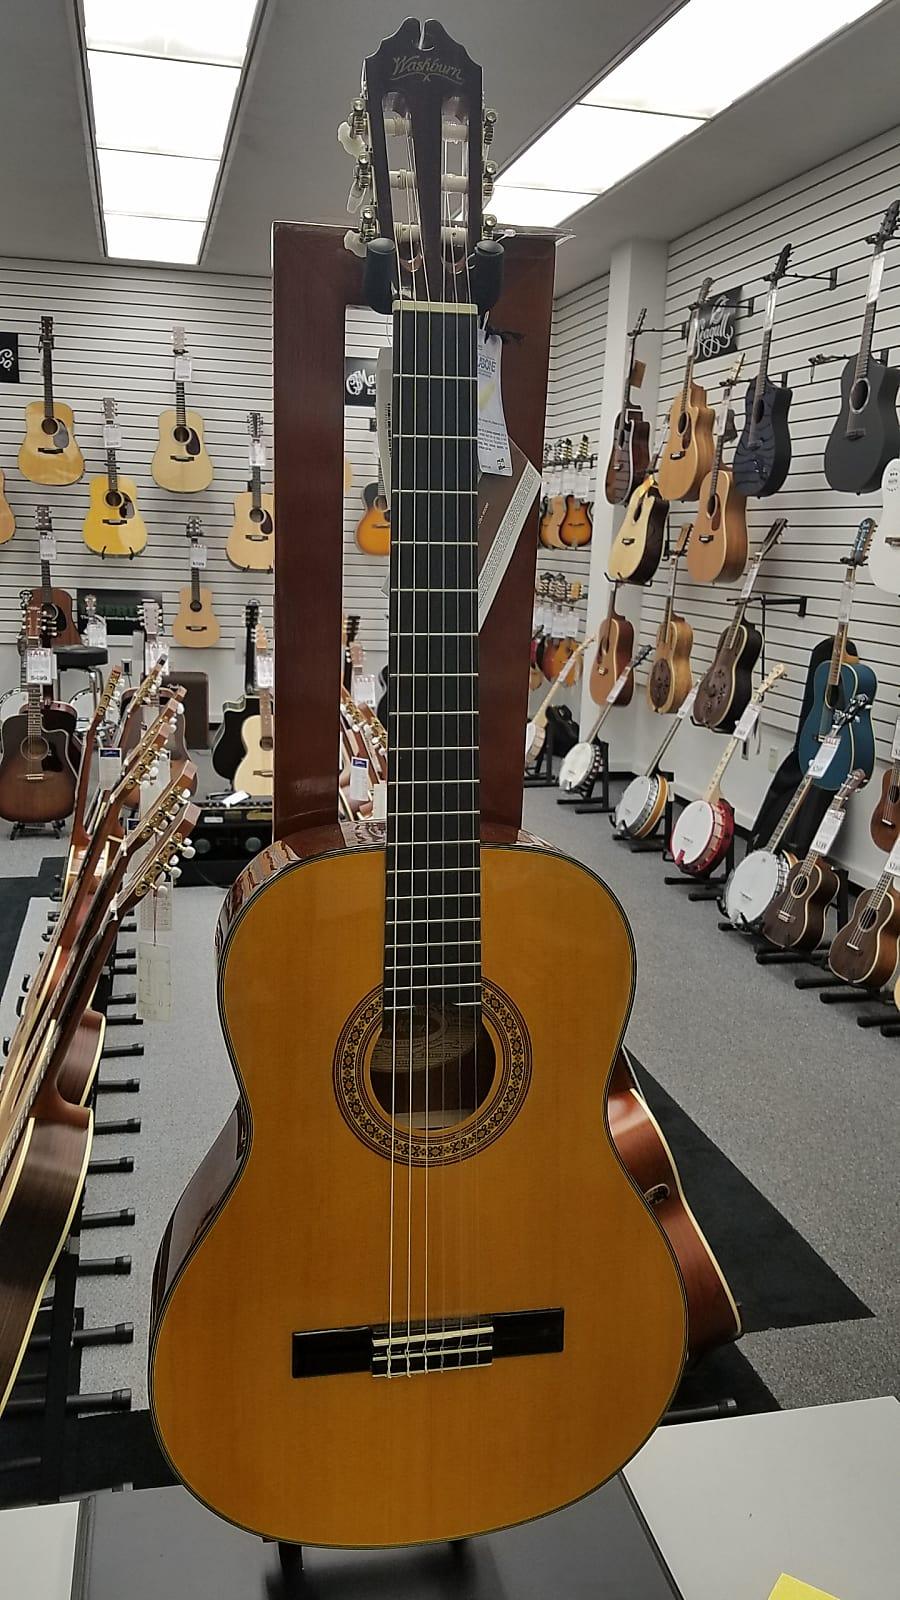 Washburn C40-A Acoustic Guitar